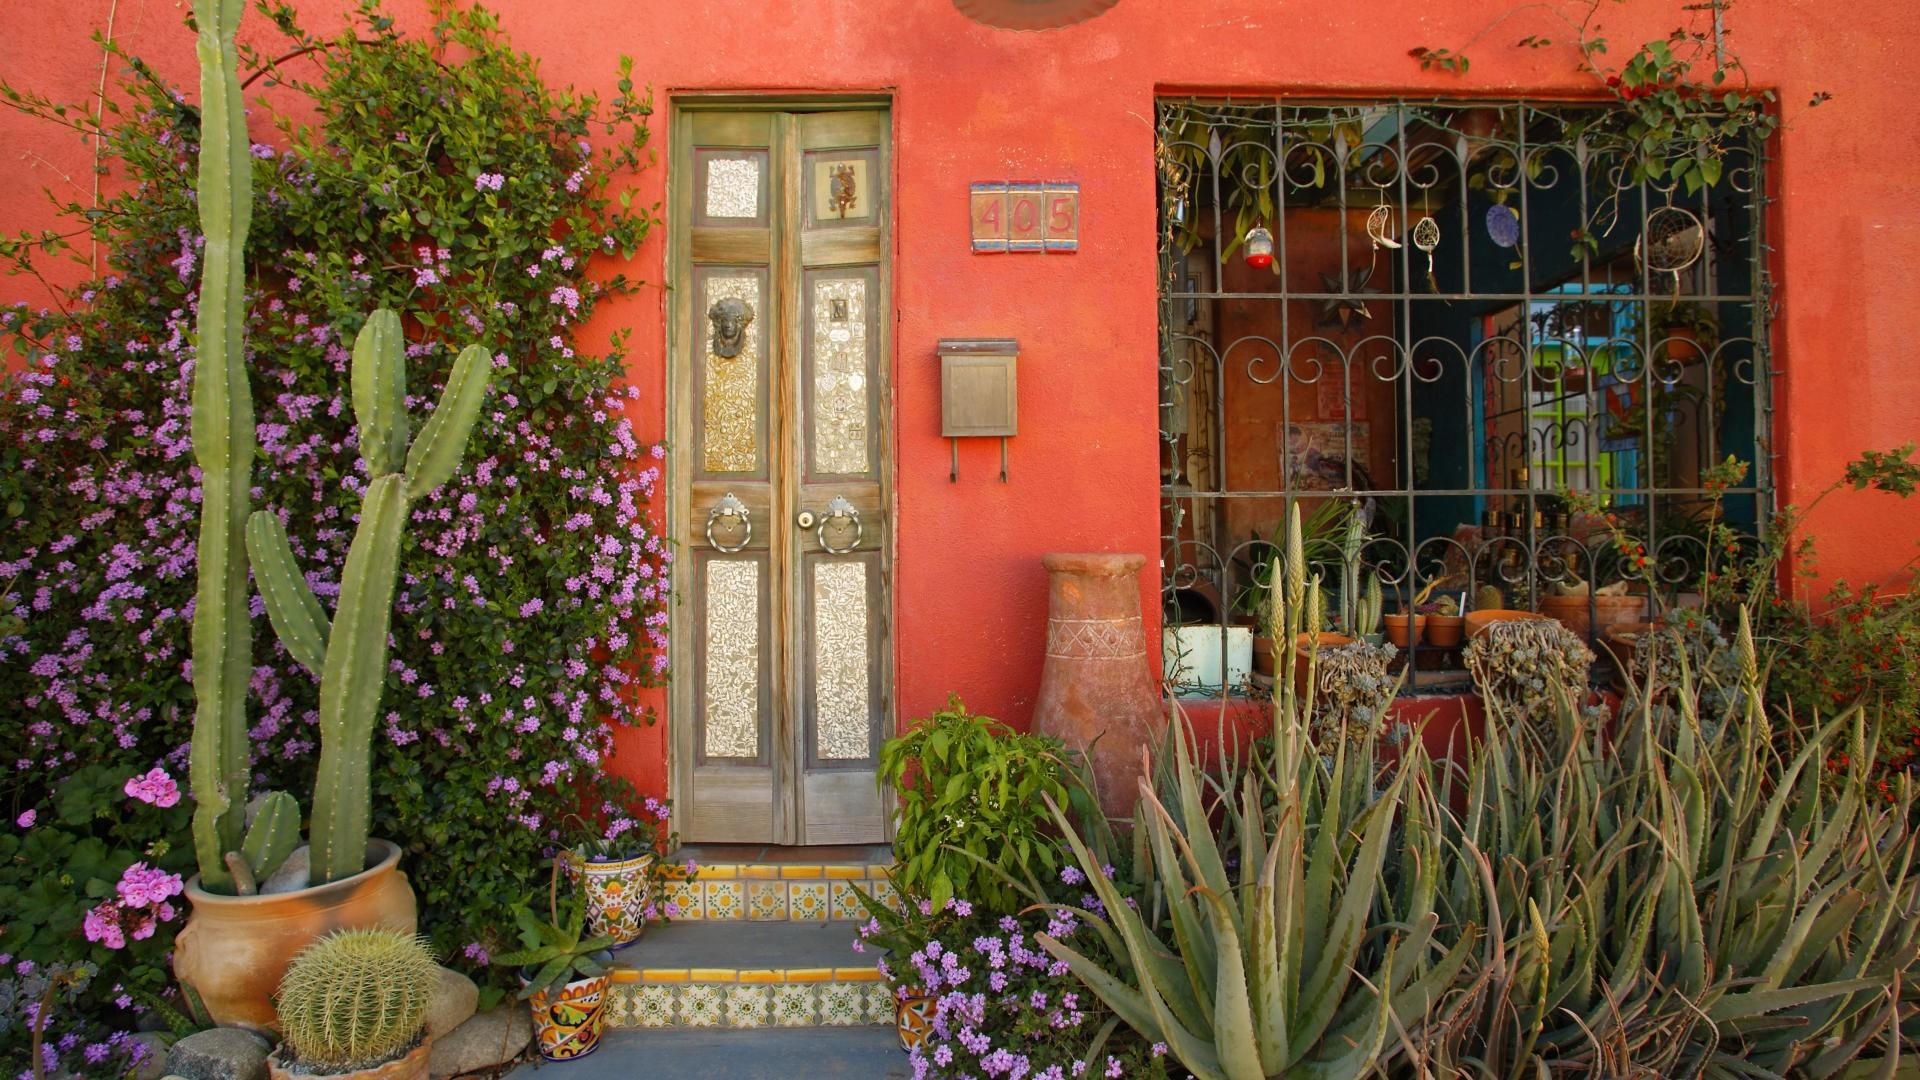 Houses – Historic Home Tuscon Arizona Restored Tucson House Cactus Window  Door Free Desktop Wallpaper for